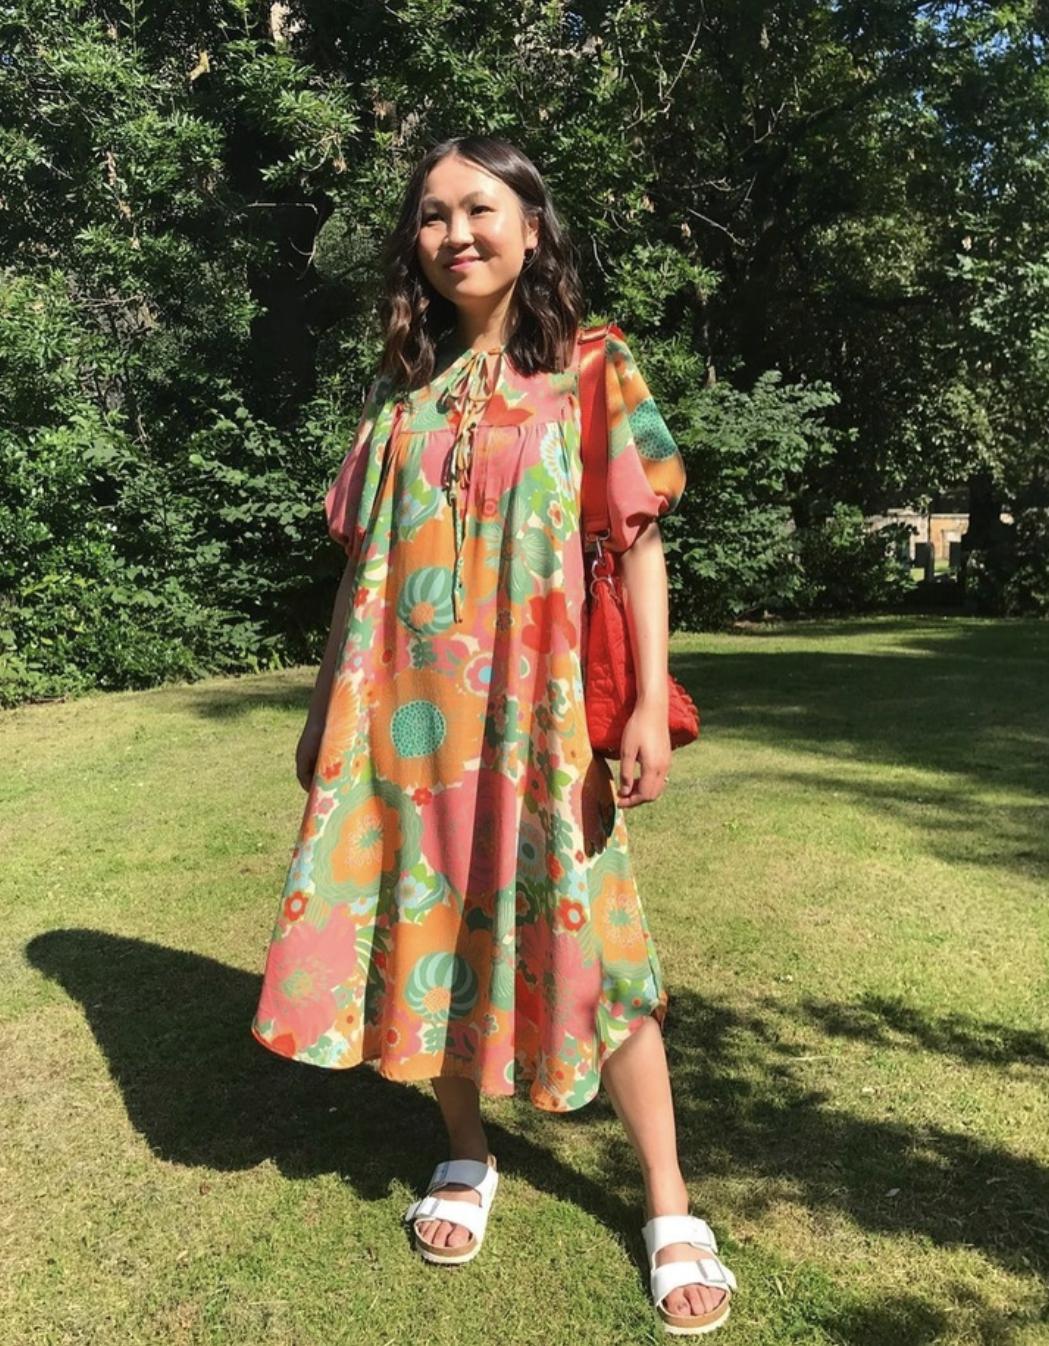 @heysewgeorgie in a Vali dress by Pattern Fantastique